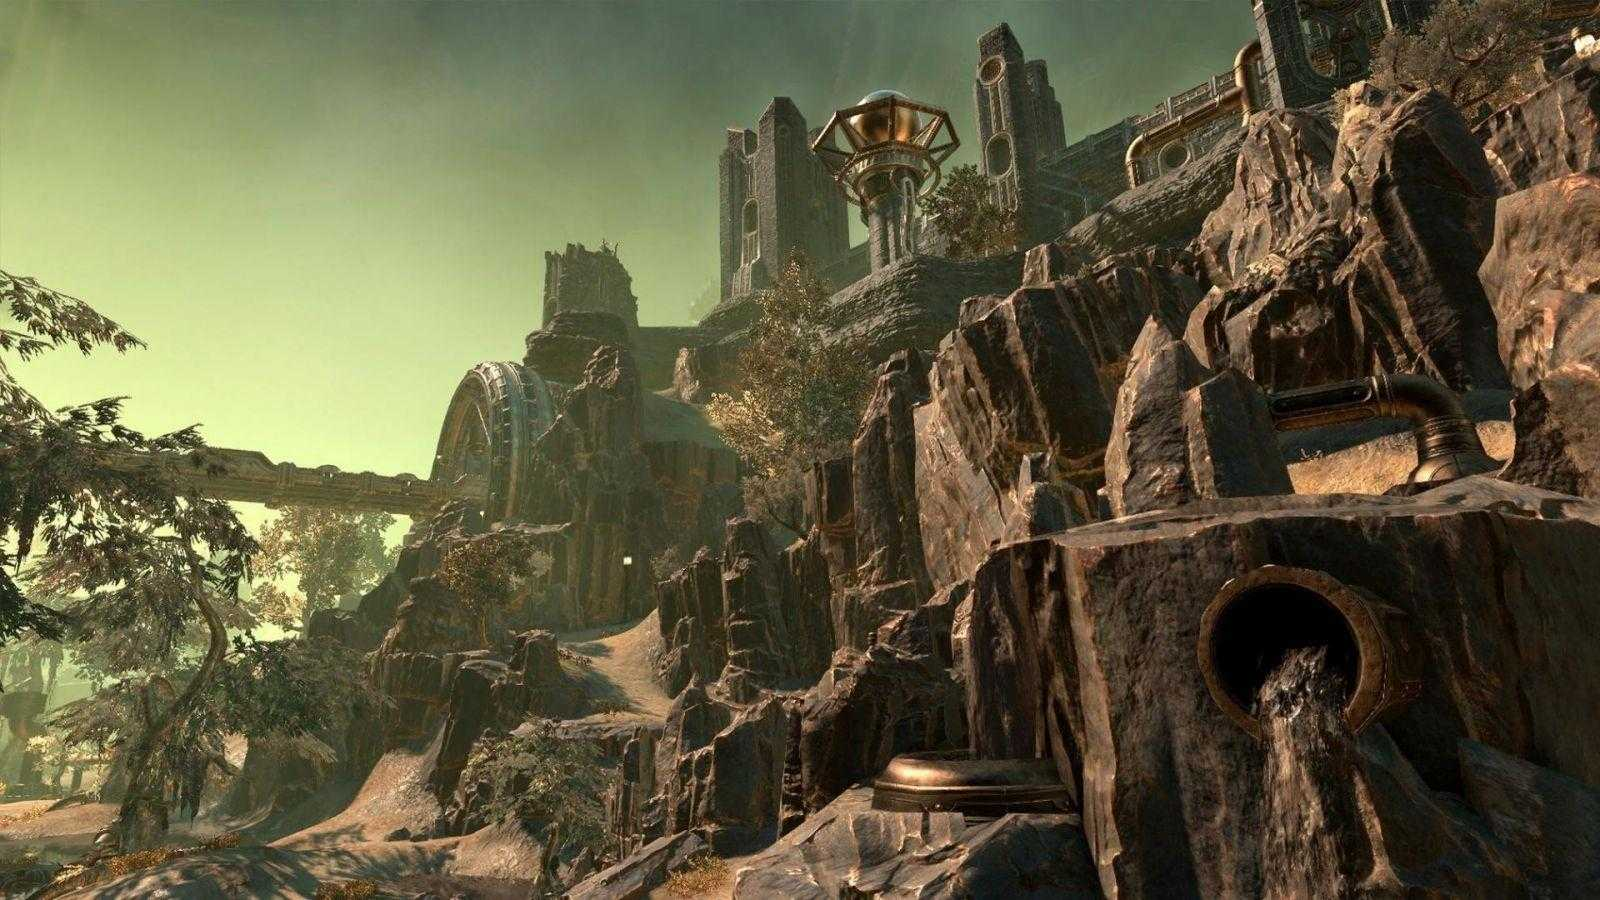 Новое дополнение к The Elder Scrolls Online уже доступно на PC (da03bc539ea35f4d2cf6e9a2835847a8)